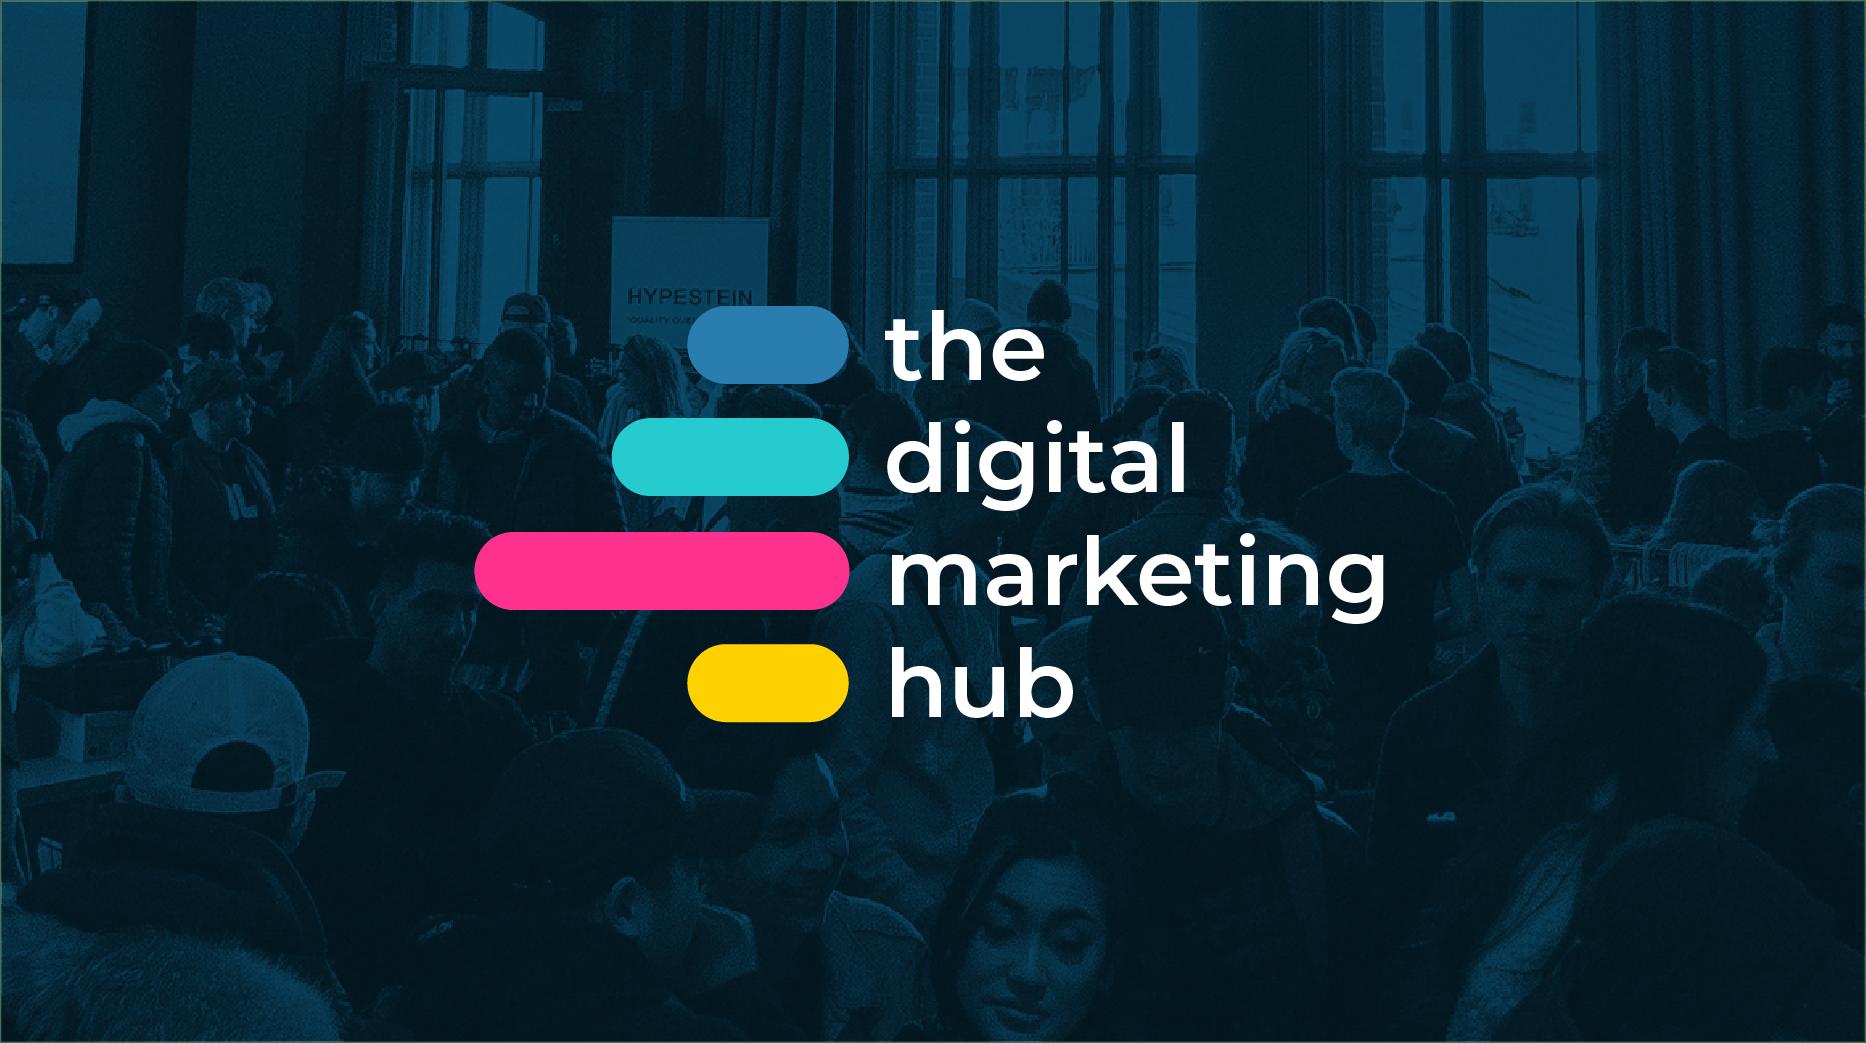 The Digital Marketing Hub Launch was a Success